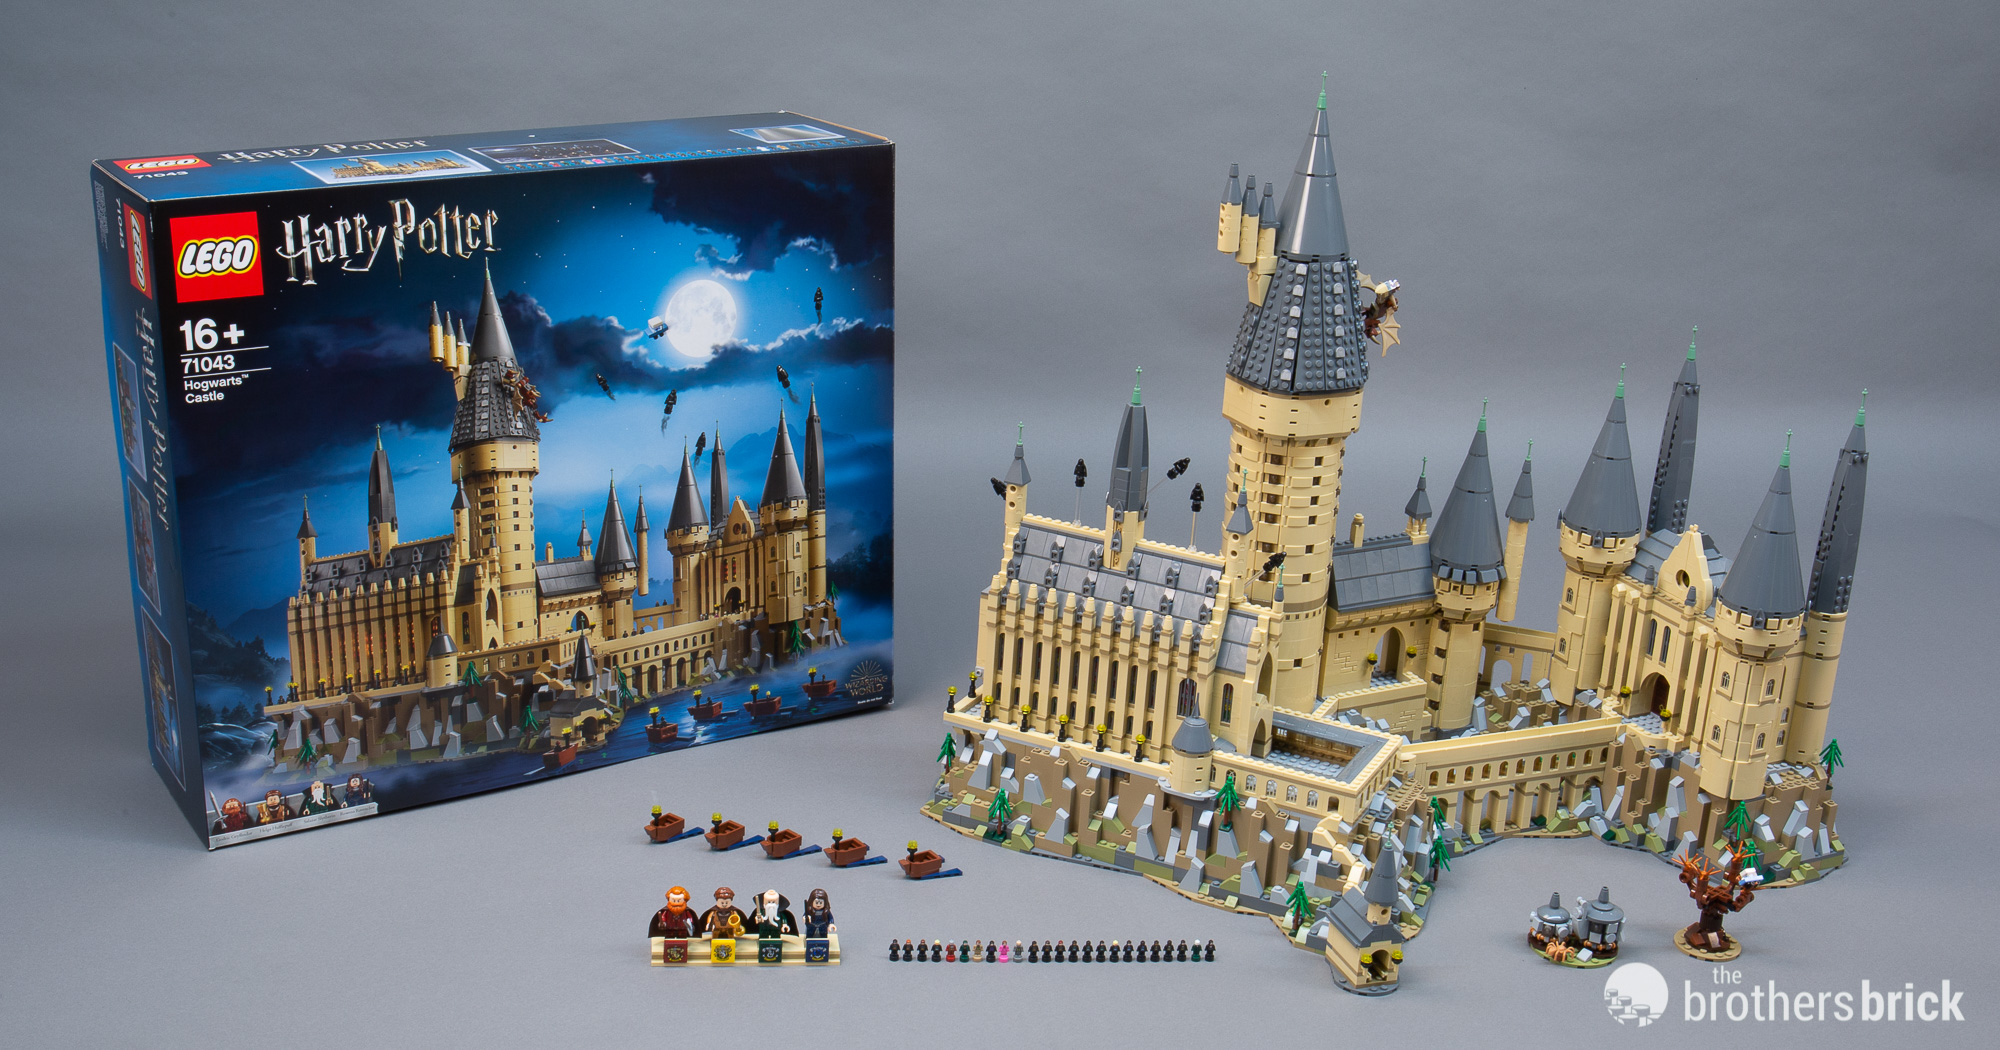 Lego Harry Potter 71043 Hogwarts Castle 1 The Brothers